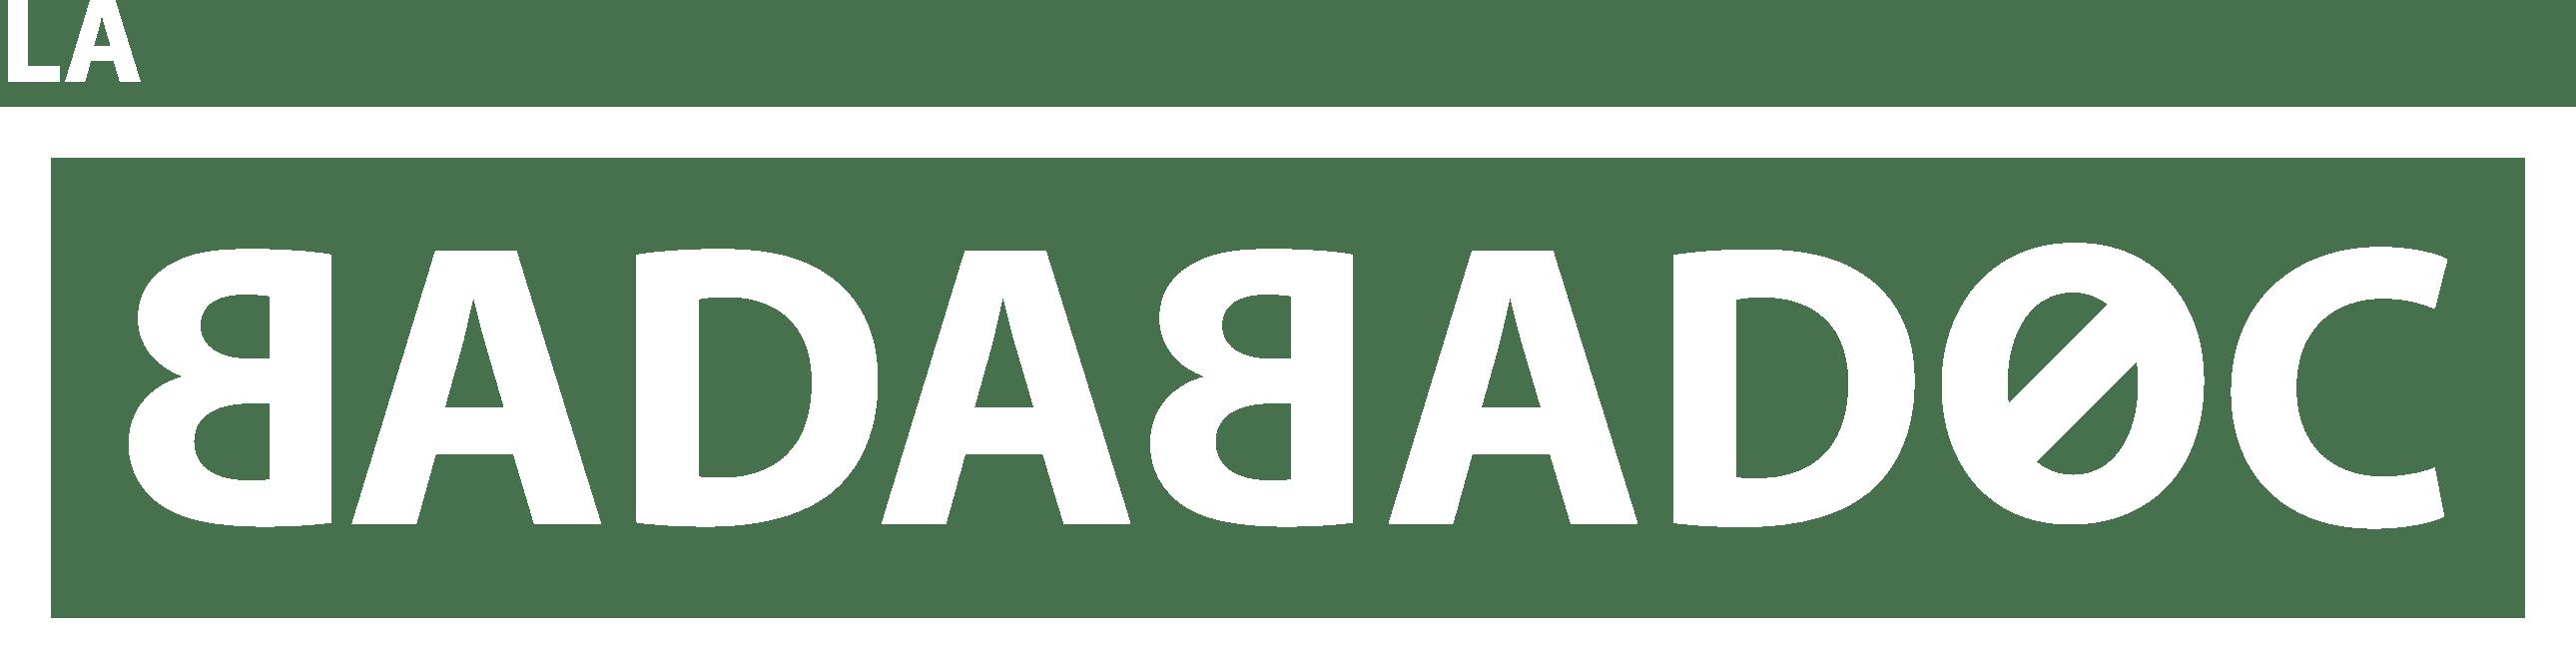 La Badabadoc